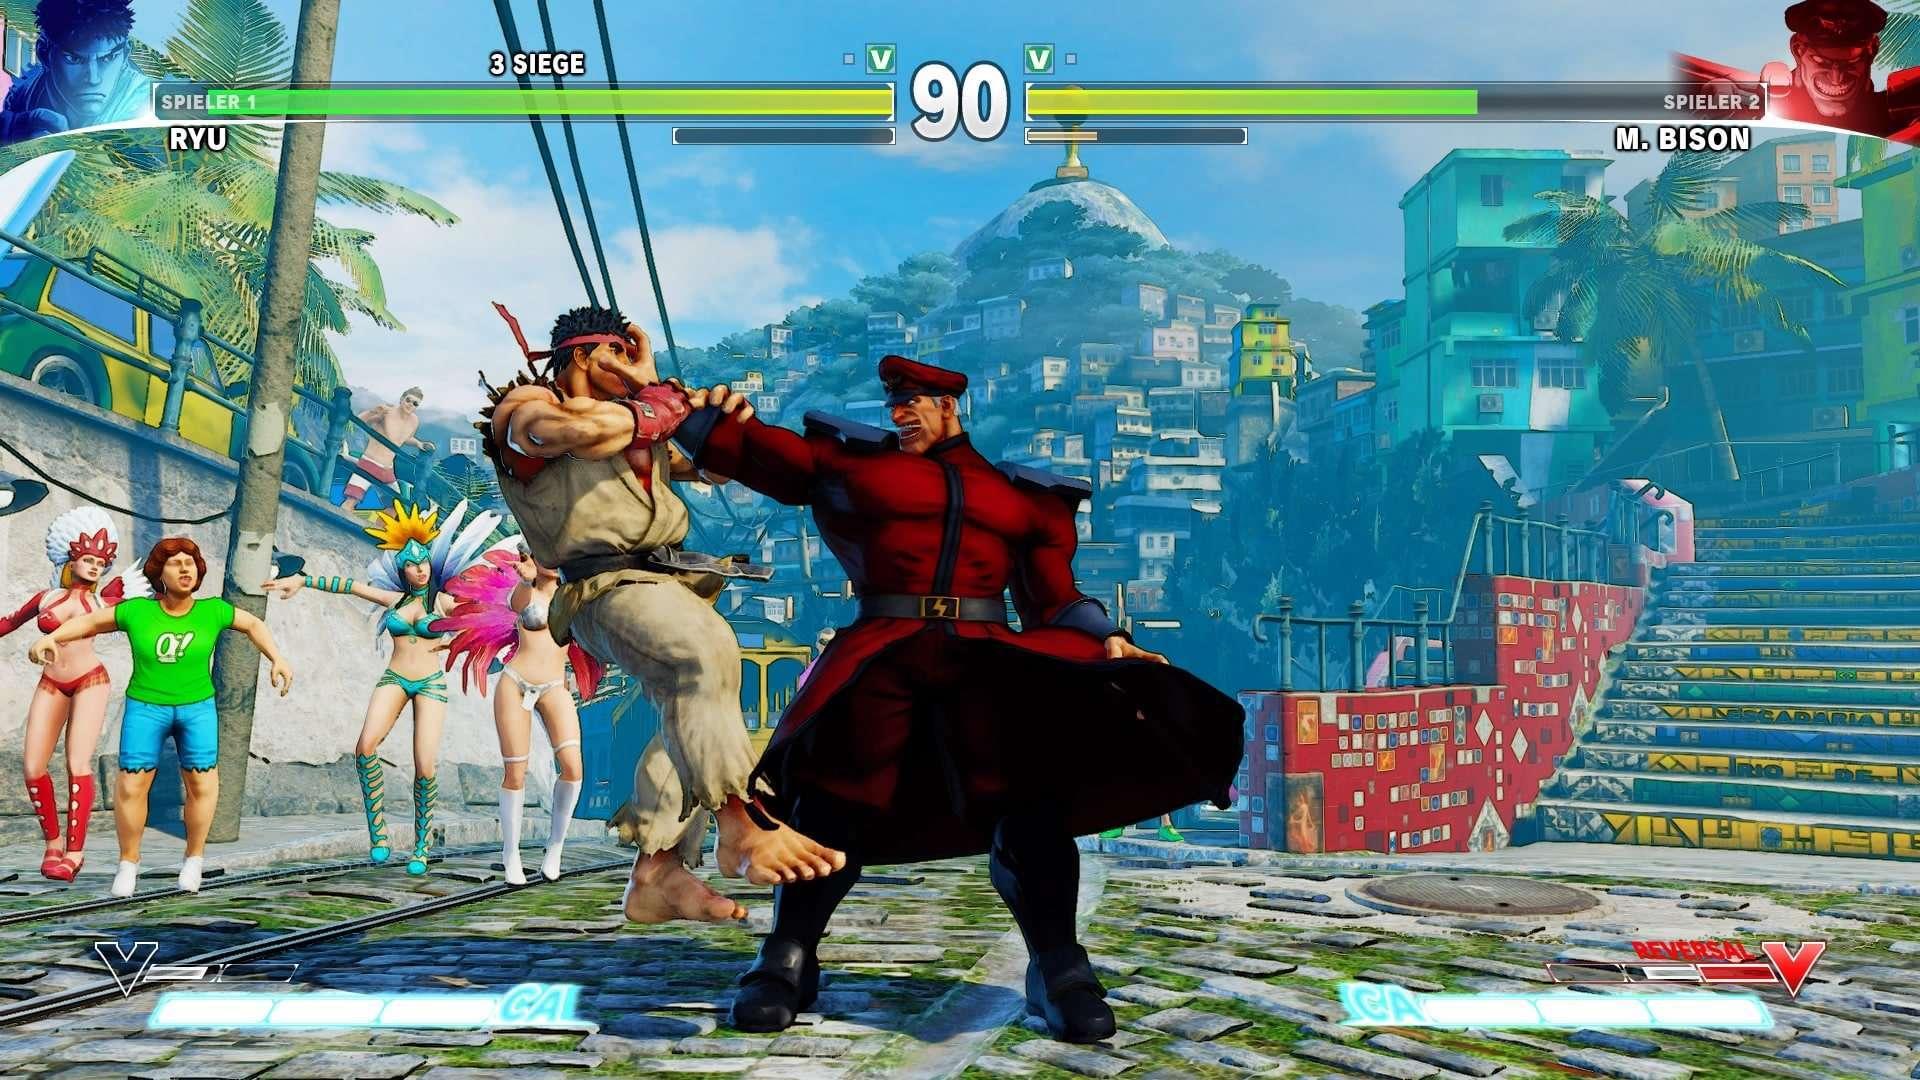 Hadoken strikes again – Street Fighter V (PS4) kurz angespielt 19 techboys.de • smarte News, auf den Punkt! Hadoken strikes again – Street Fighter V (PS4) kurz angespielt